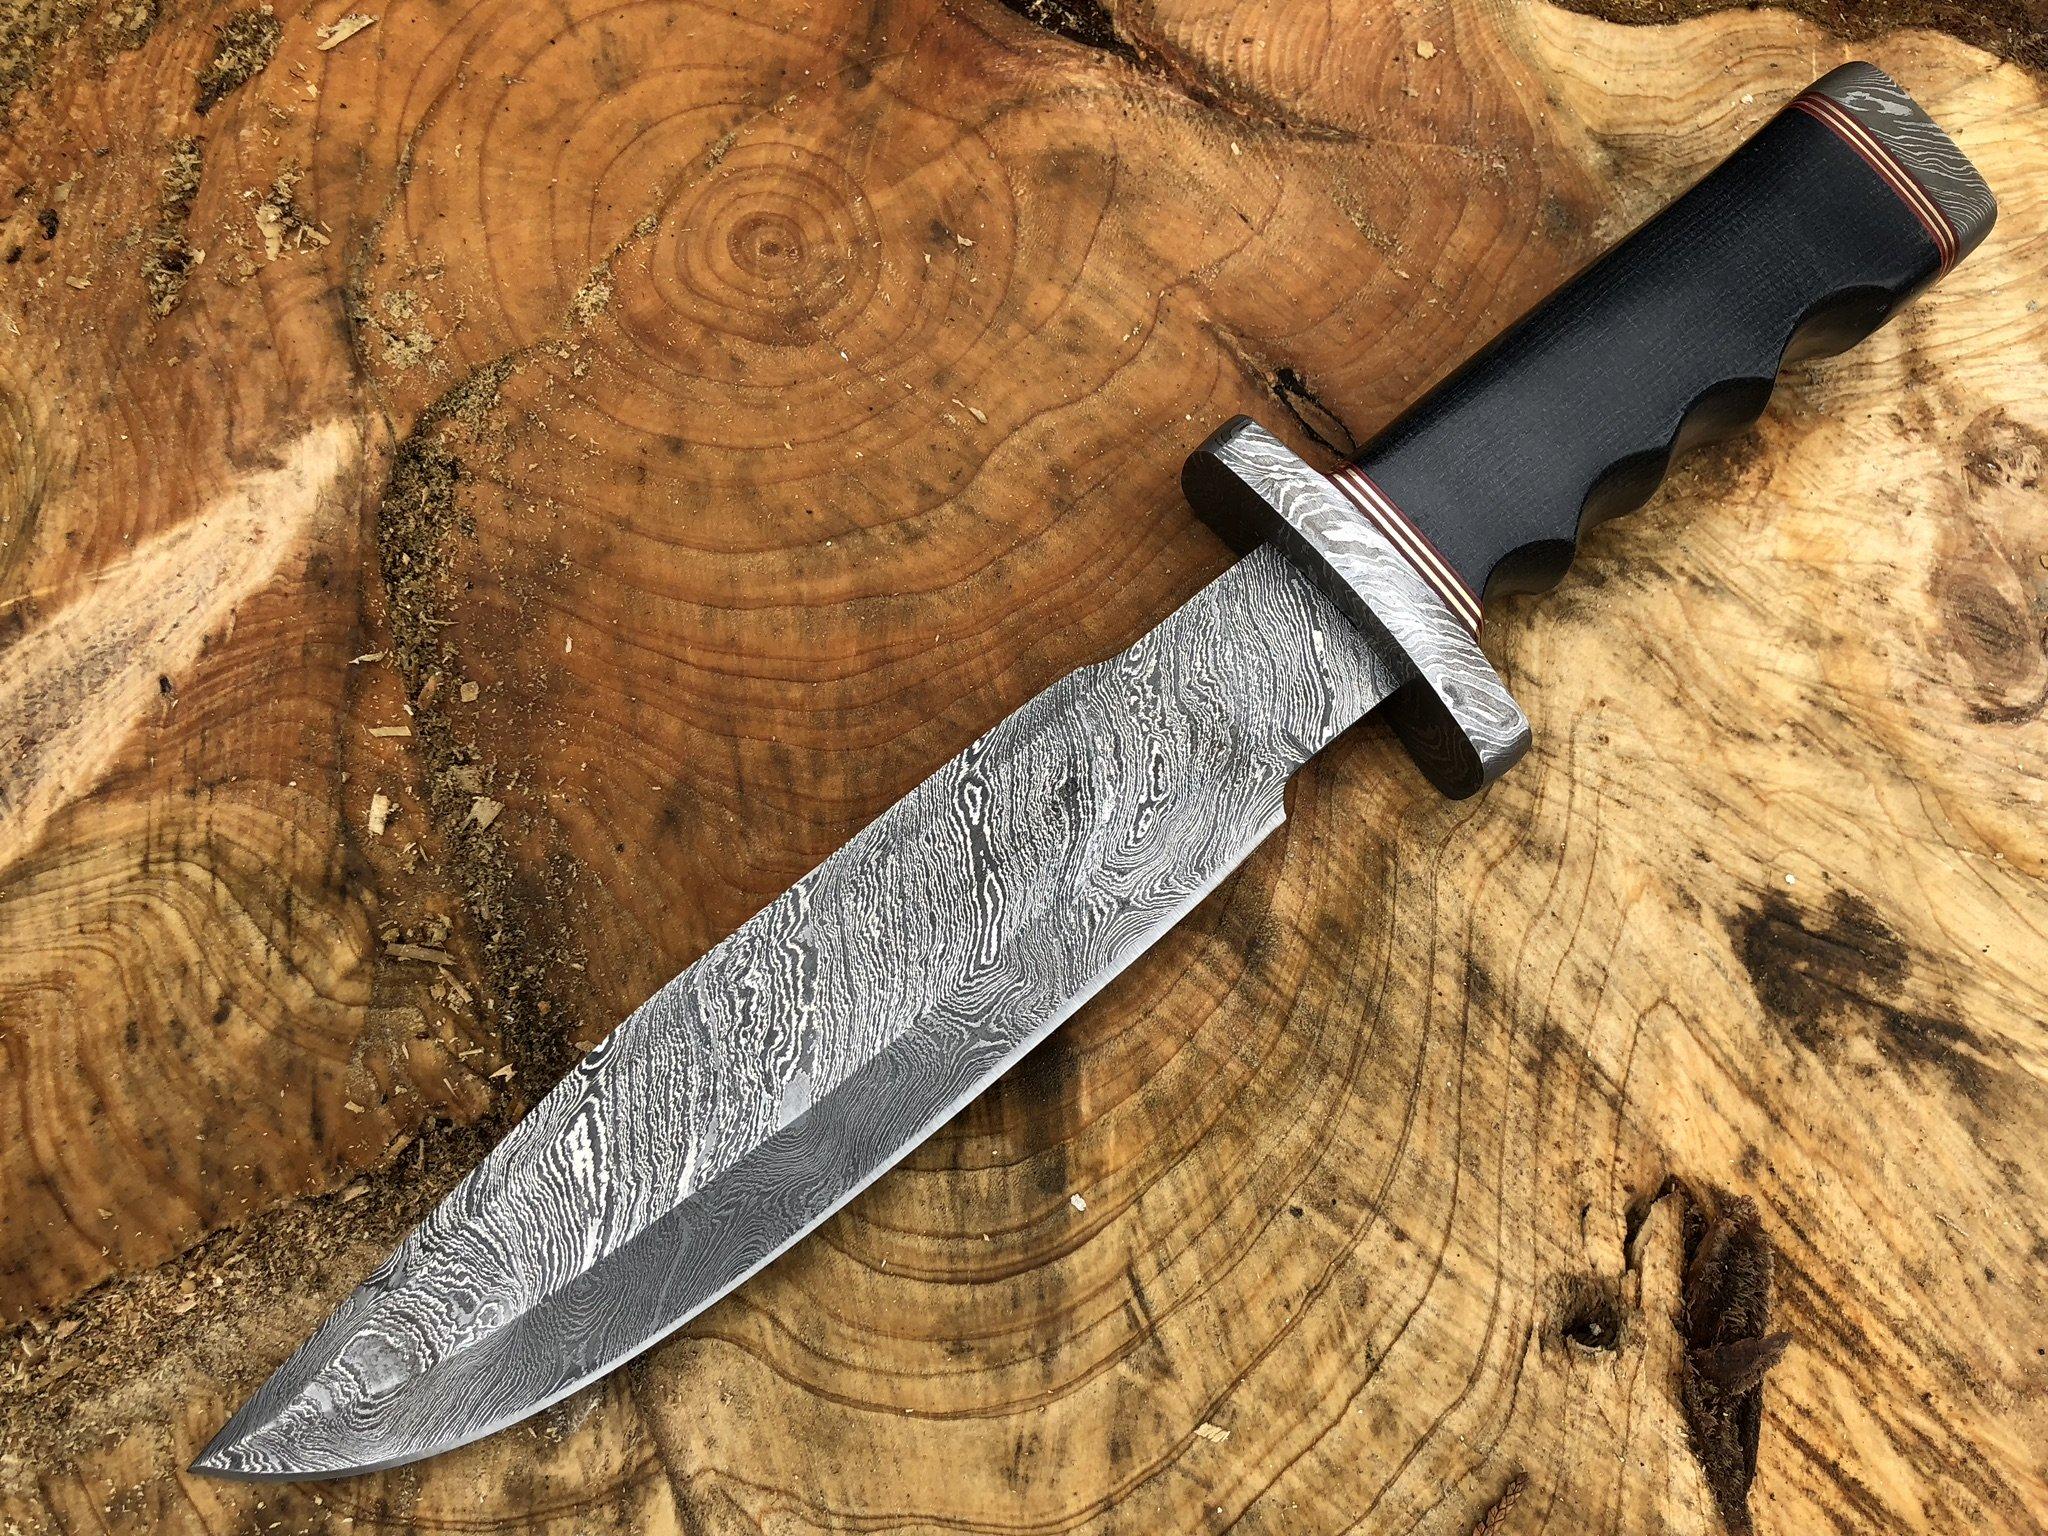 Damascus steel hunting knife handmade knife fixed blade (Black micarta handle and damascus guard)